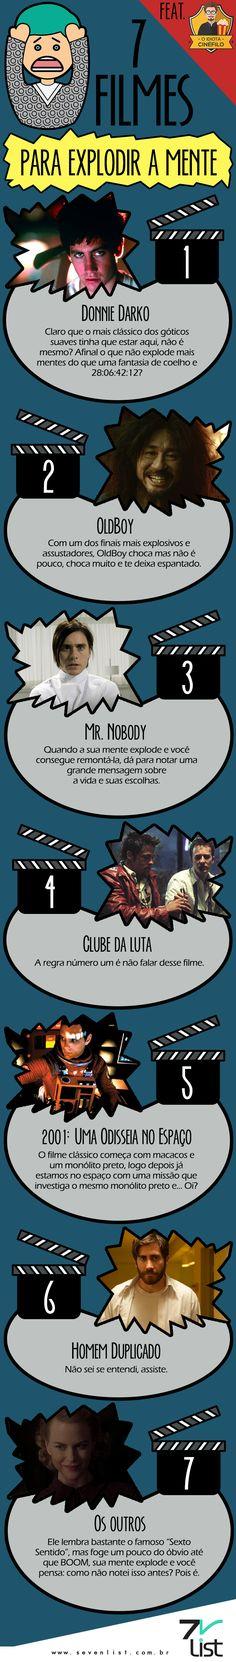 #SevenList #IdiotaCinéfilo #Art #Infográfico #Filmes #Cinema #Cinema #Movies